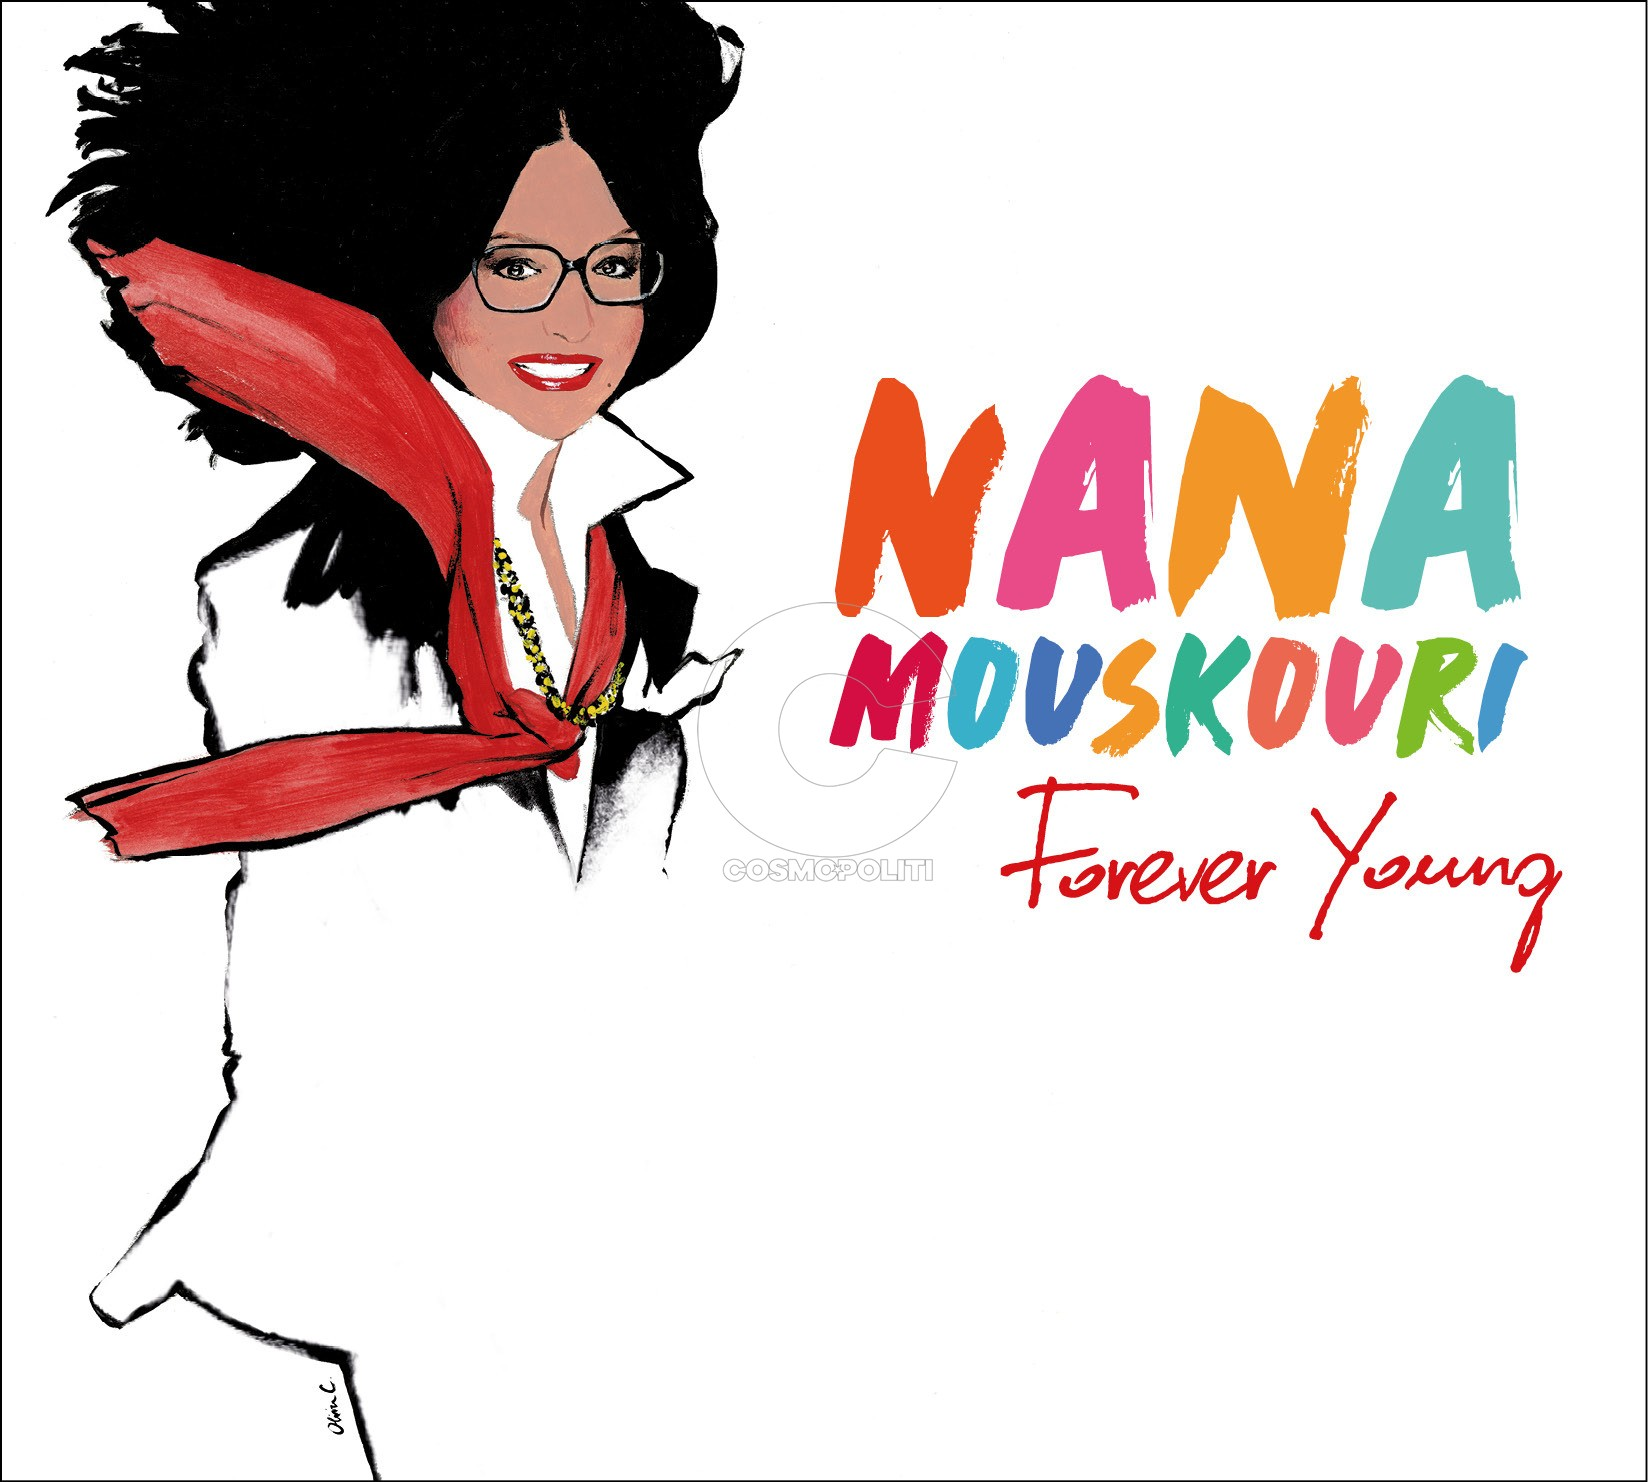 Nana Mouskouri Forever Young